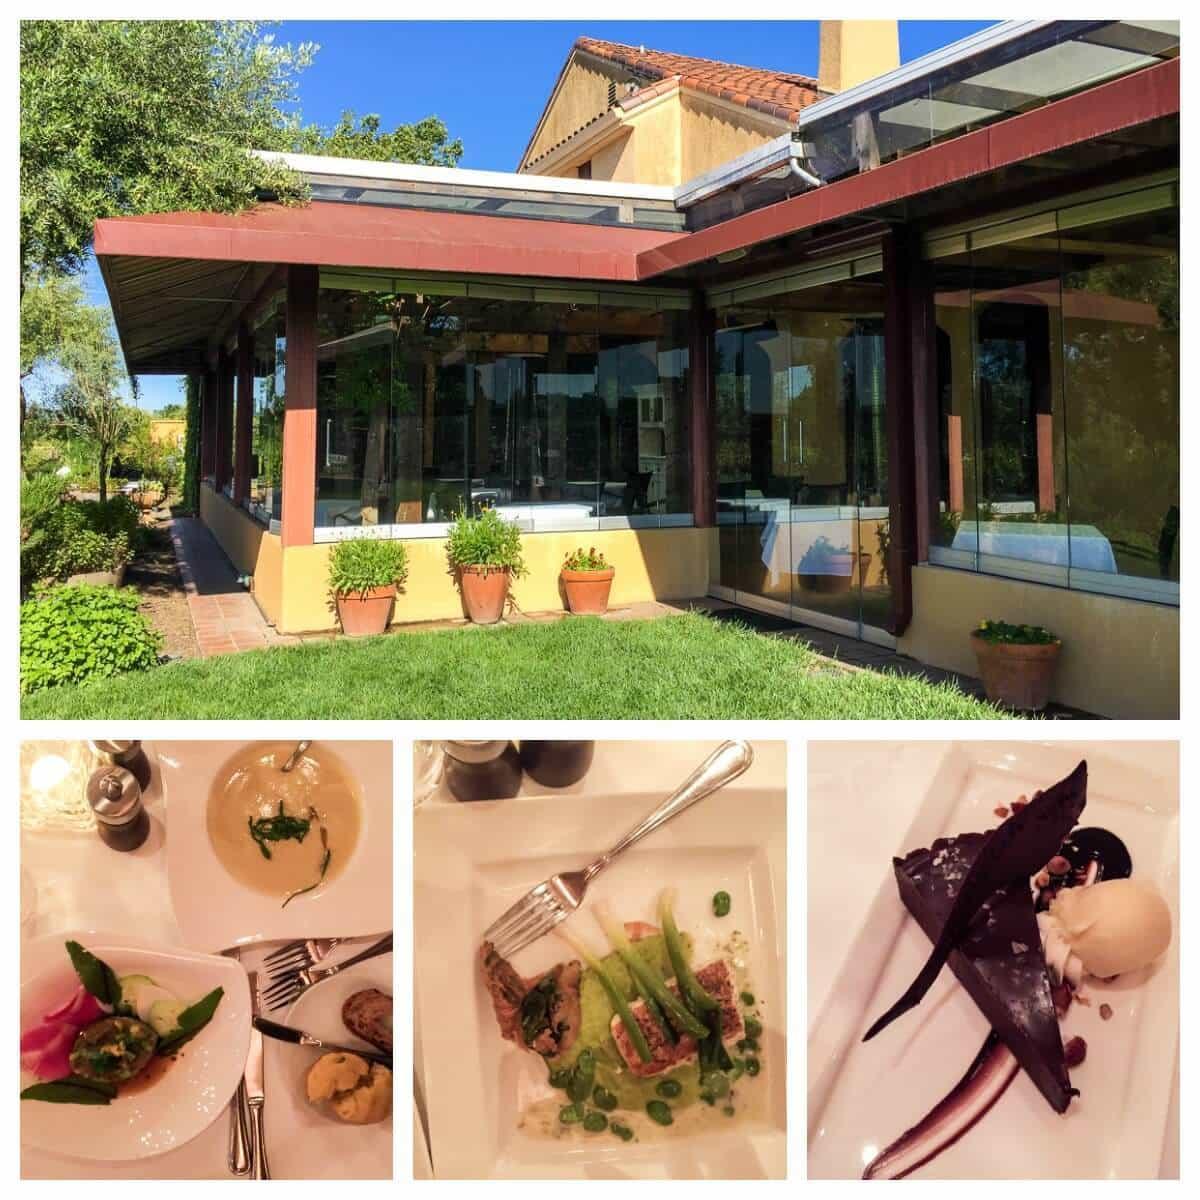 John Ash Co Sonoma Restaurant. One of the best restaurants you'll ever try!